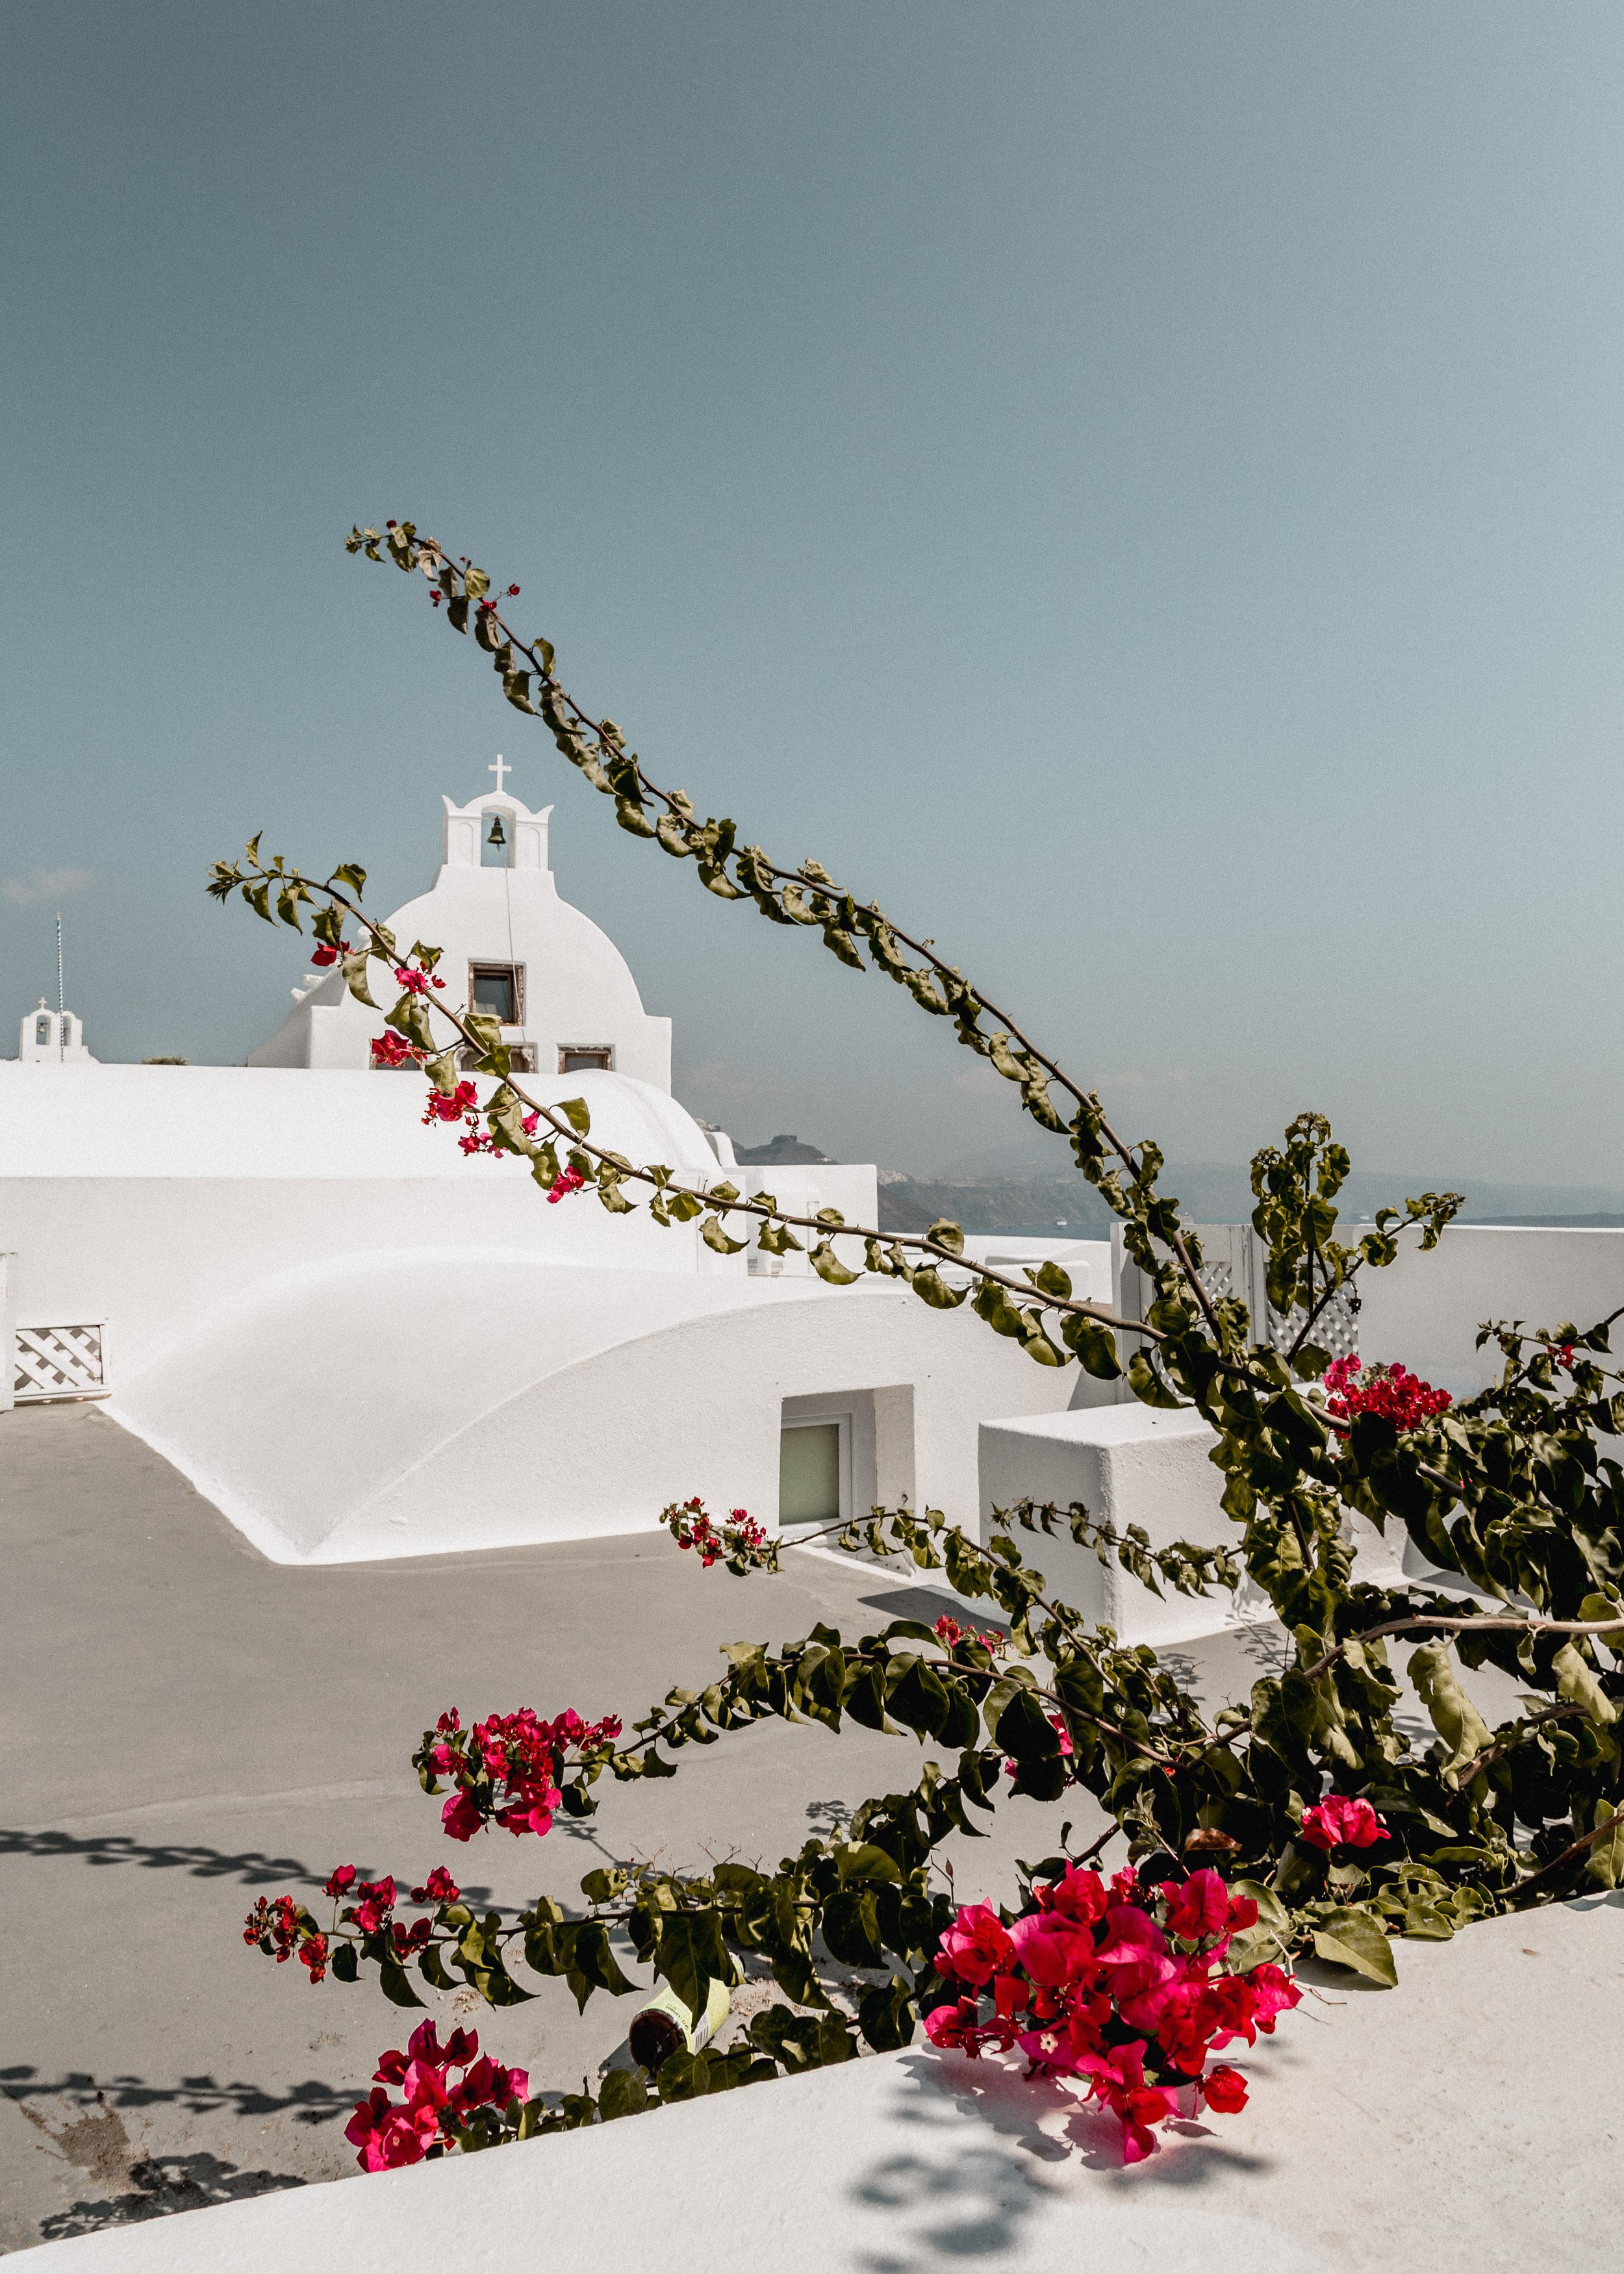 09-santorini-ia-oia-greece-travel-bougainvillea-anna-elina-lahti-photographer.jpg